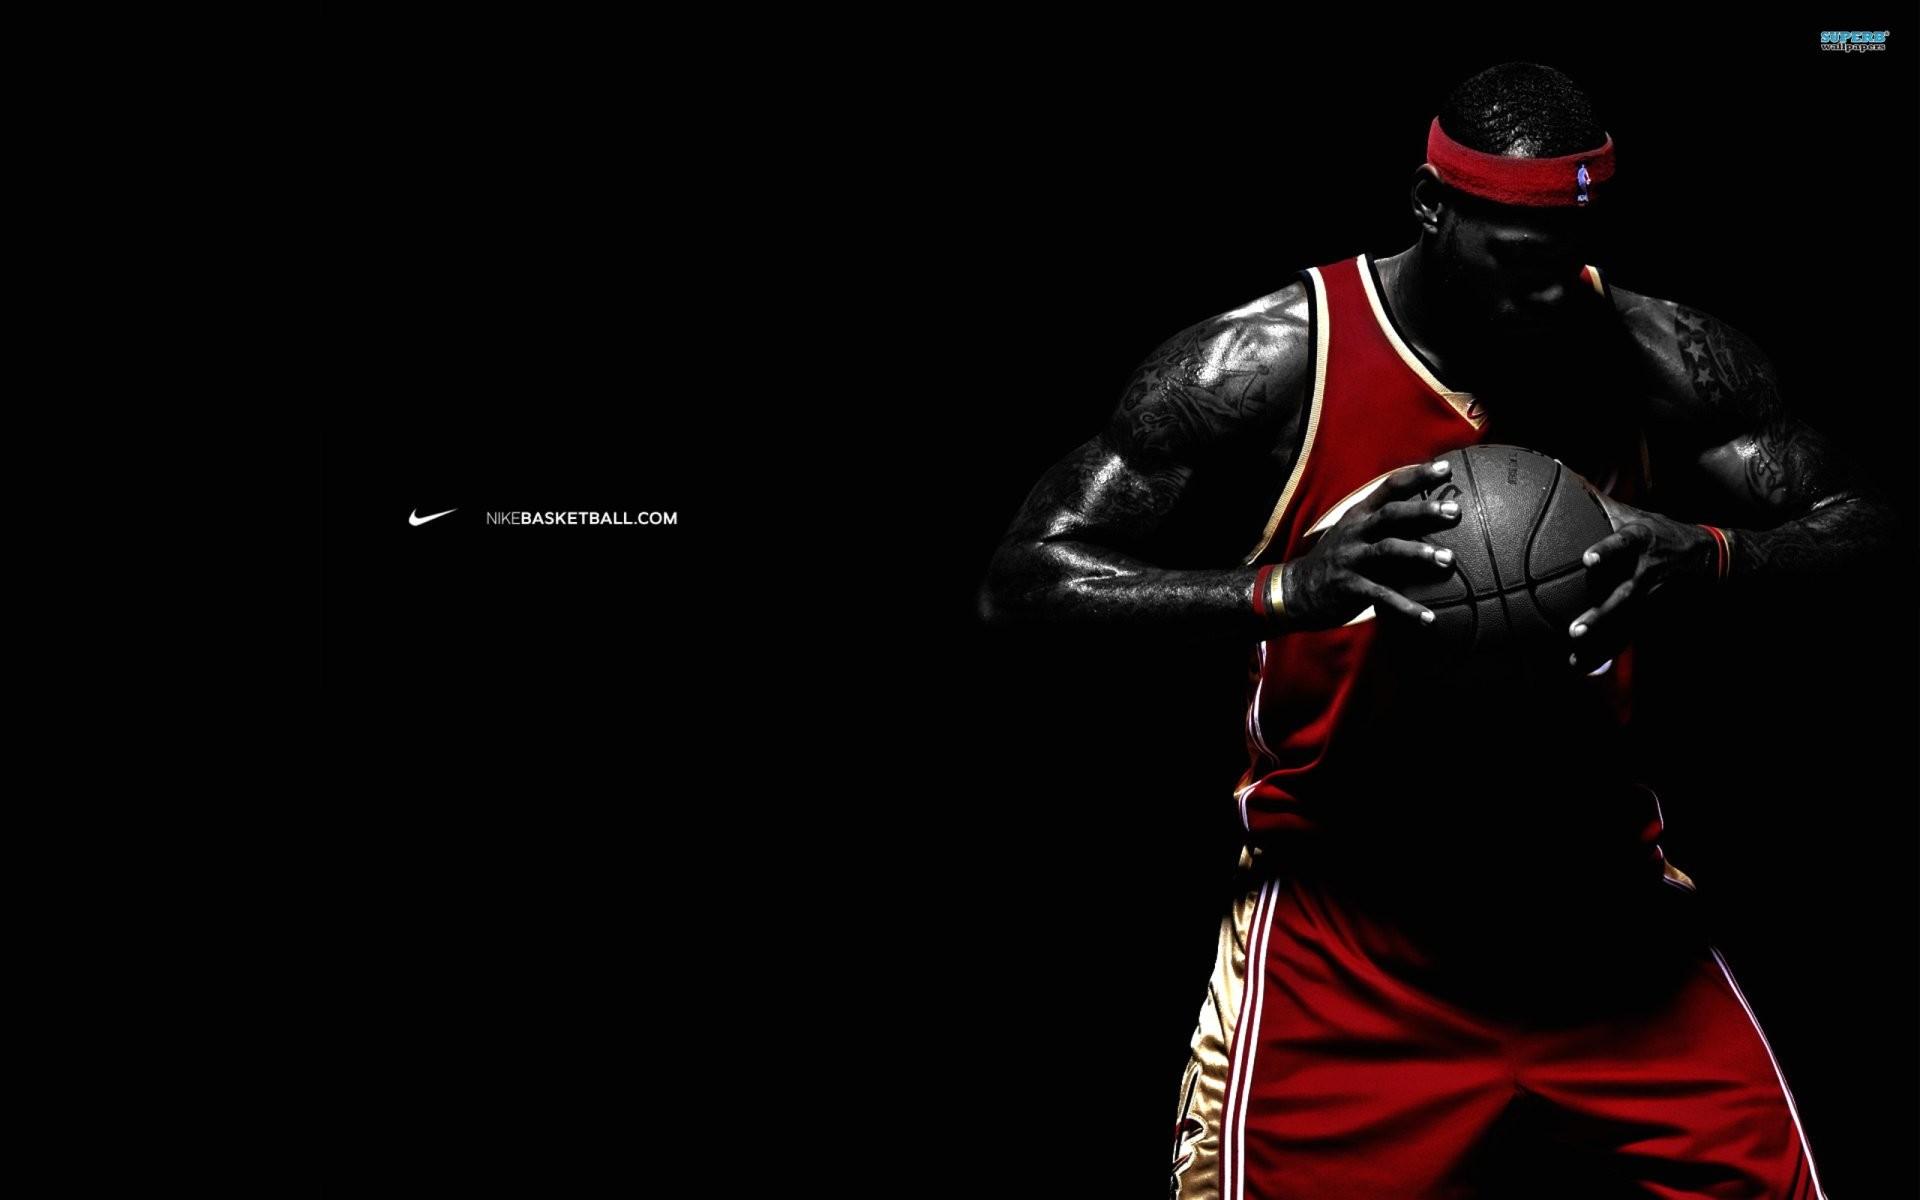 Sport Wallpaper Cheap Nike: Cool Nike Wallpaper (65+ Images